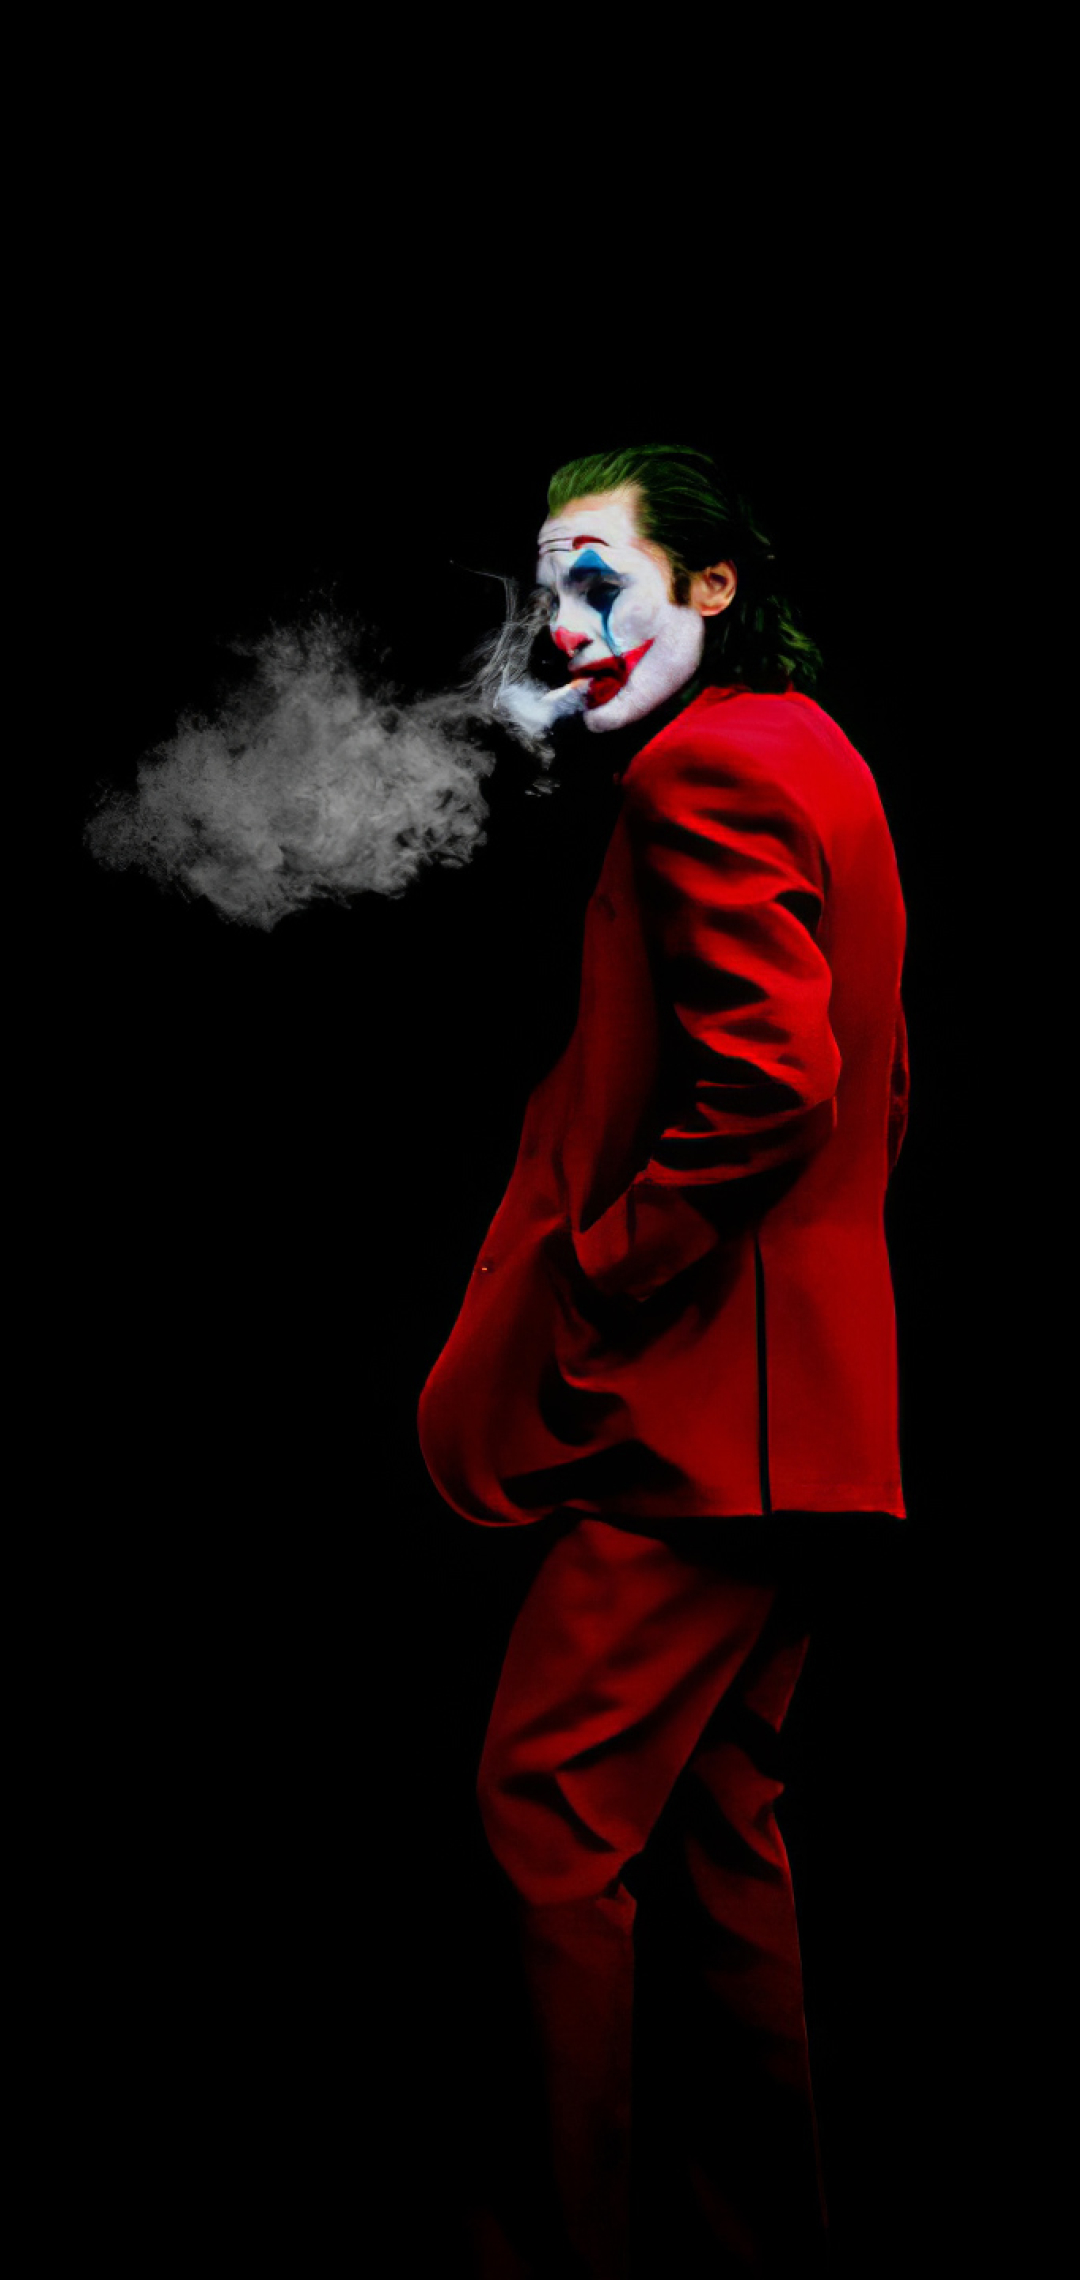 New Joker 2020 Art Wallpaper in 1080x2280 Resolution